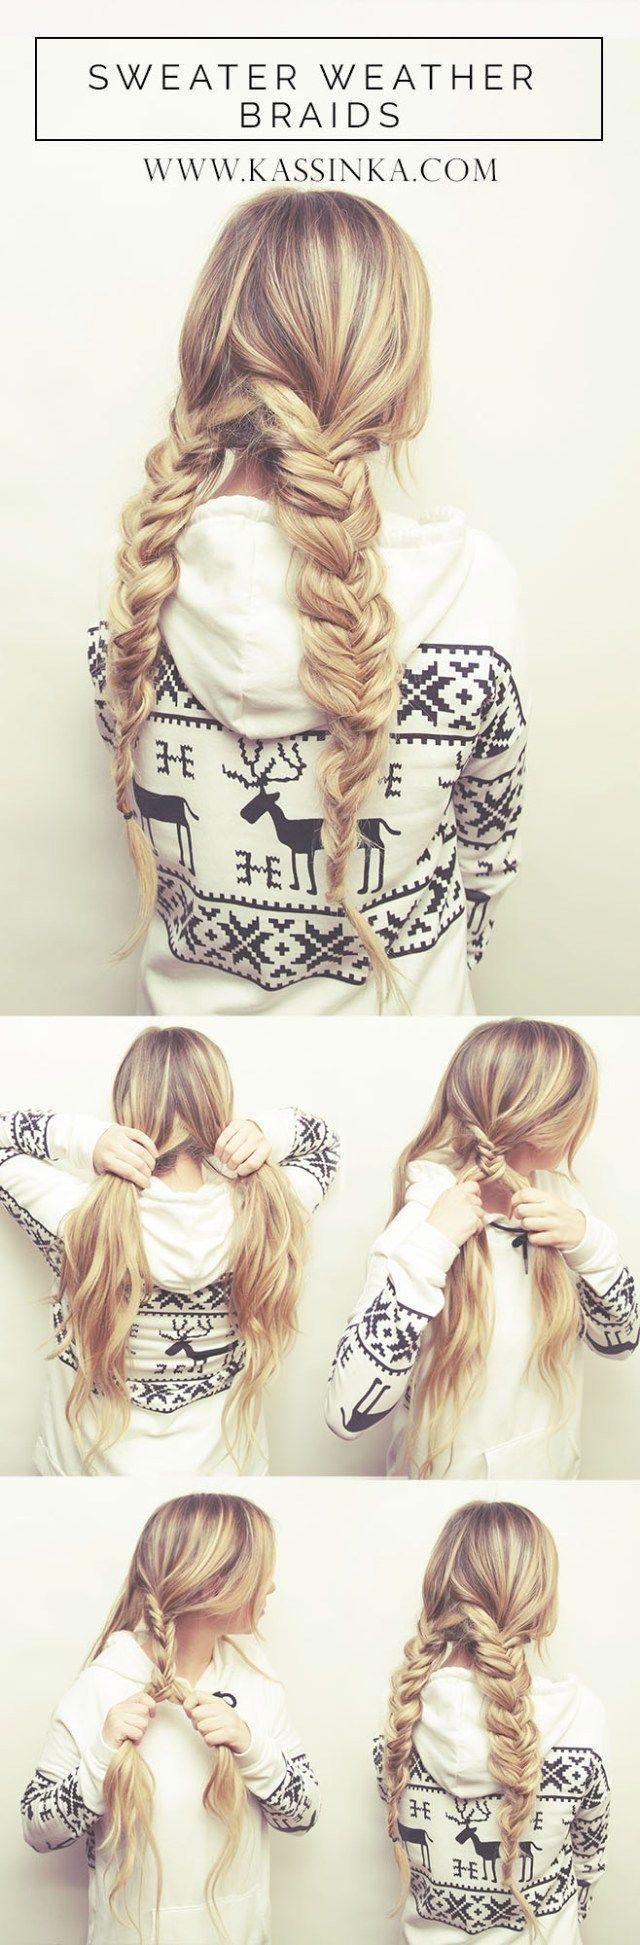 Sweater Weather Braids Hair Tutorial (Kassinka)